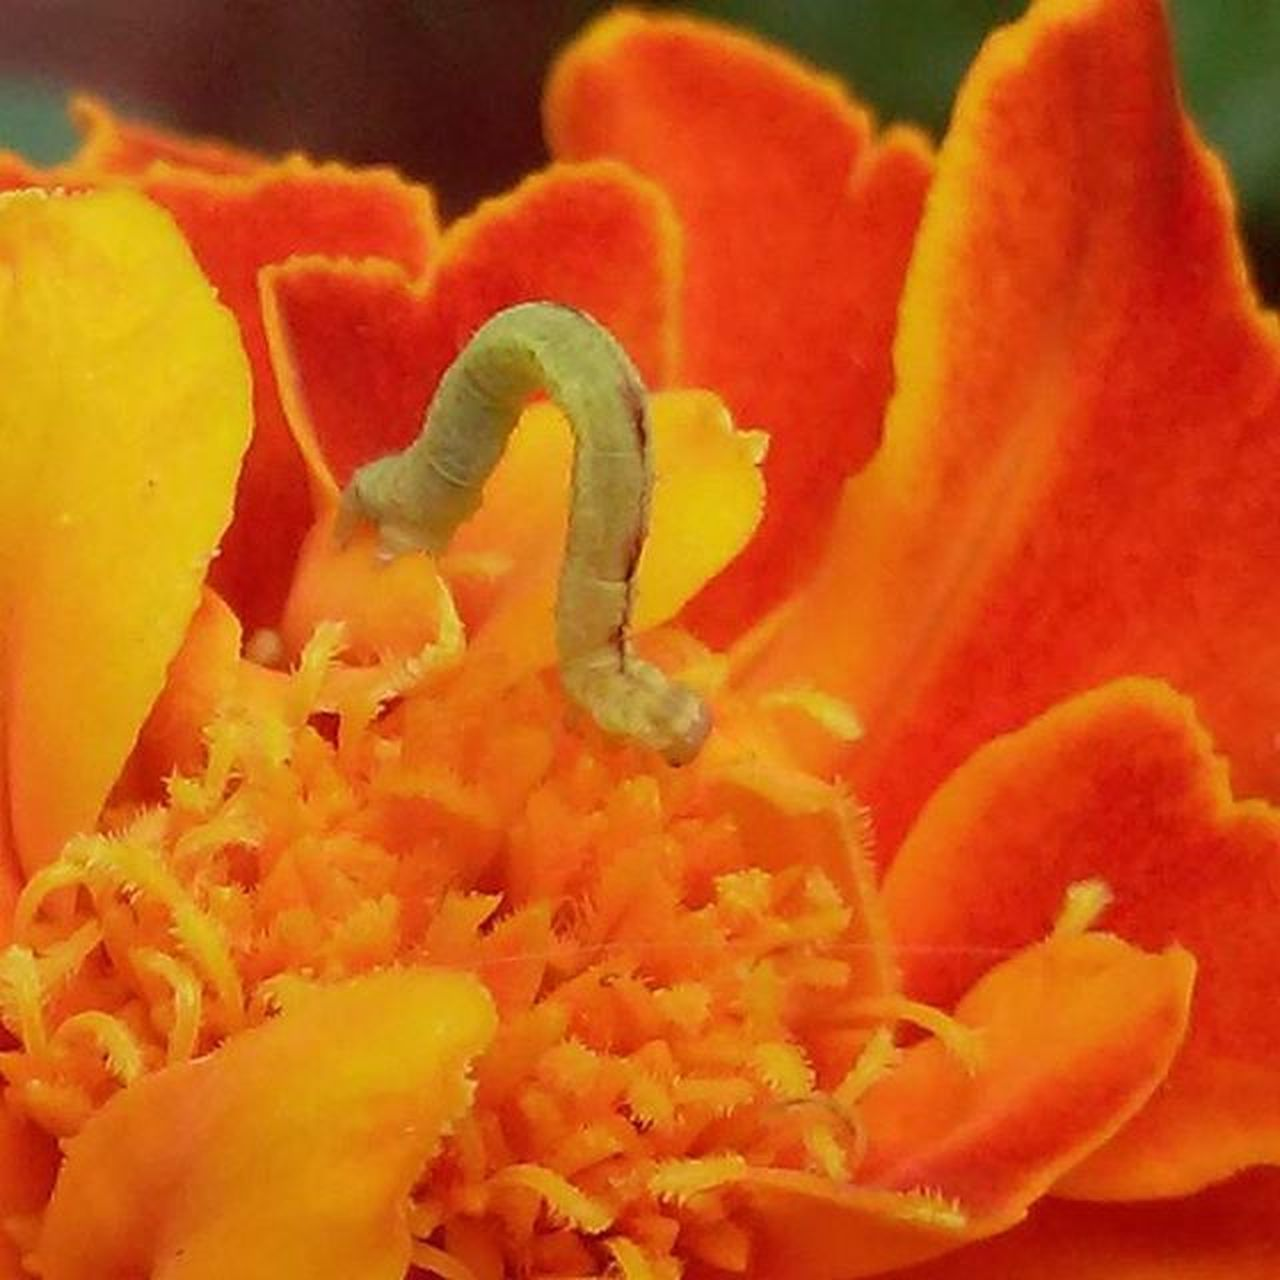 Smallest inch worm I've ever seen! 🐛 Inchworm Bugsofinstagram Bugs Creepycrawly Thingsthatcrawl